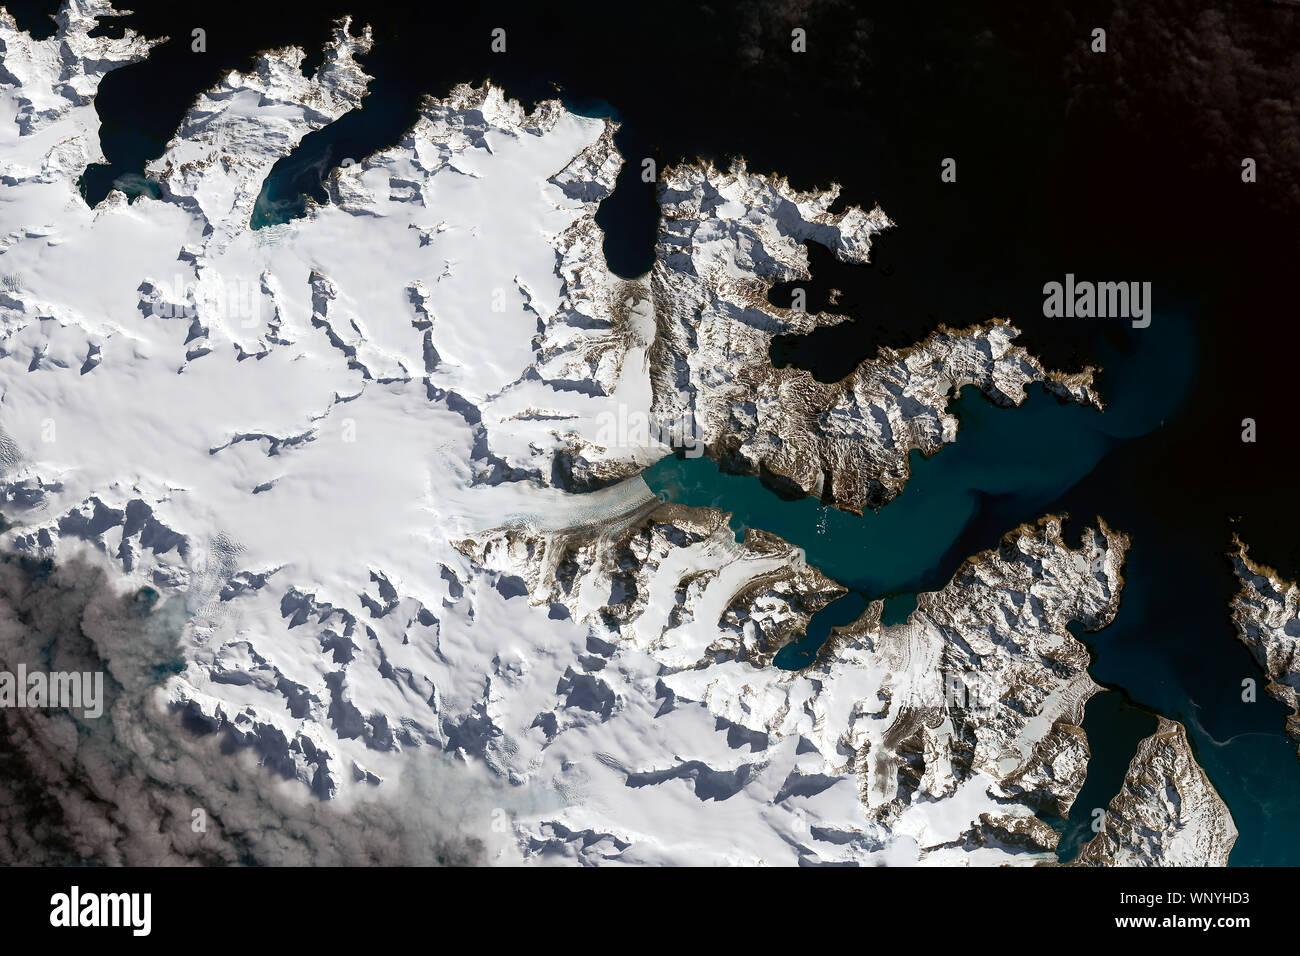 Glaciers, tidewater glaciers, South Georgia Island, September 14, 2016, by NASA/ Joshua Stevens/DPA Stock Photo